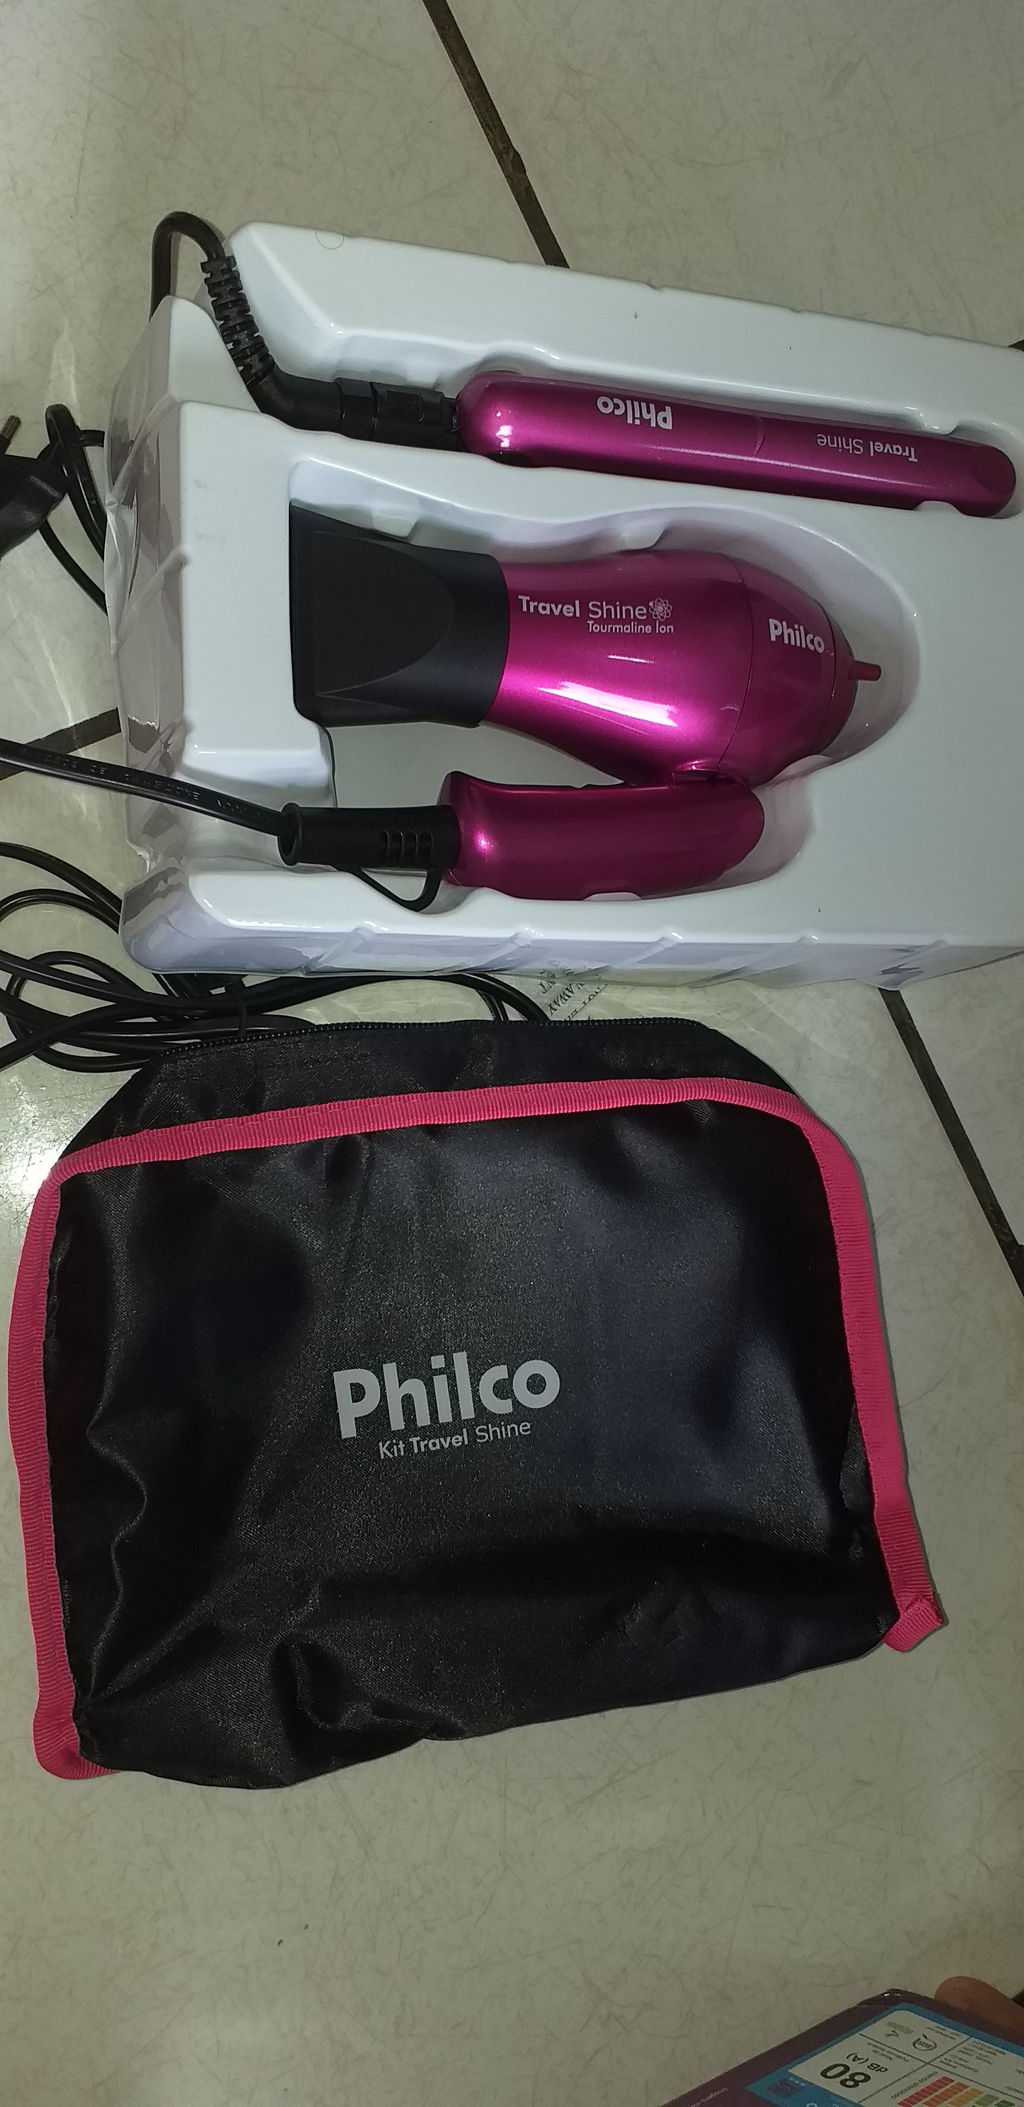 98f41e857 Kit Travel Shine Prancha e Secador Rosa Philco - Havan Mobile